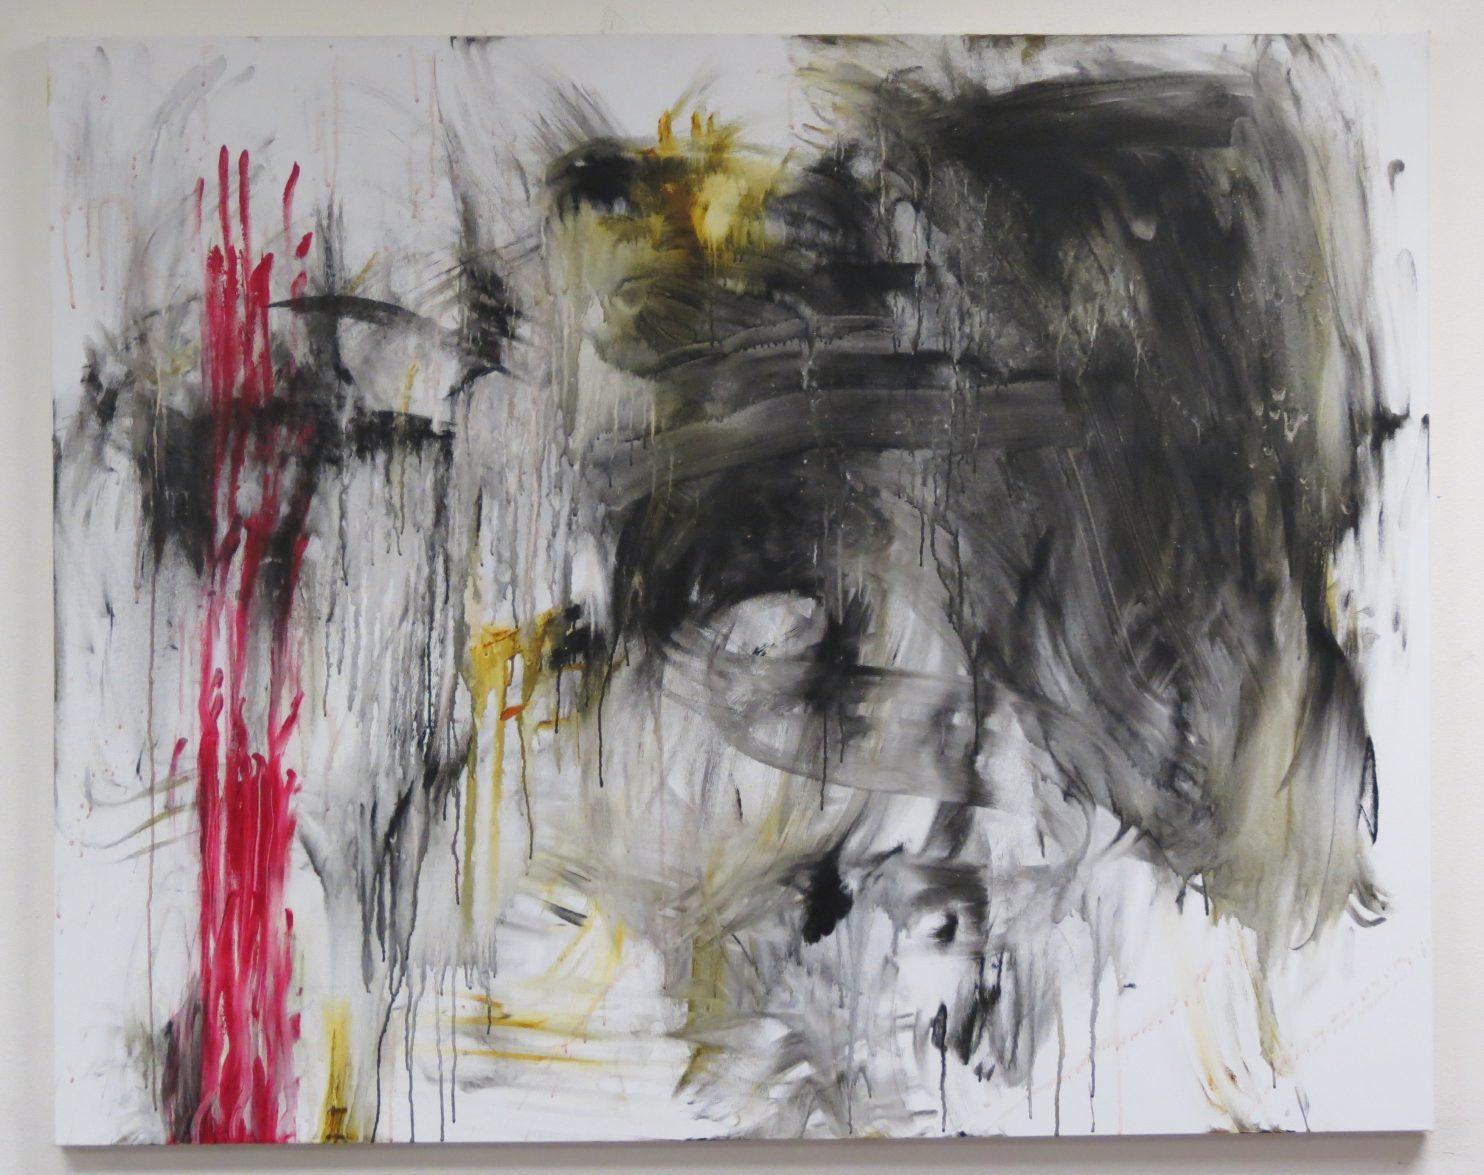 Tears by David Carpenter